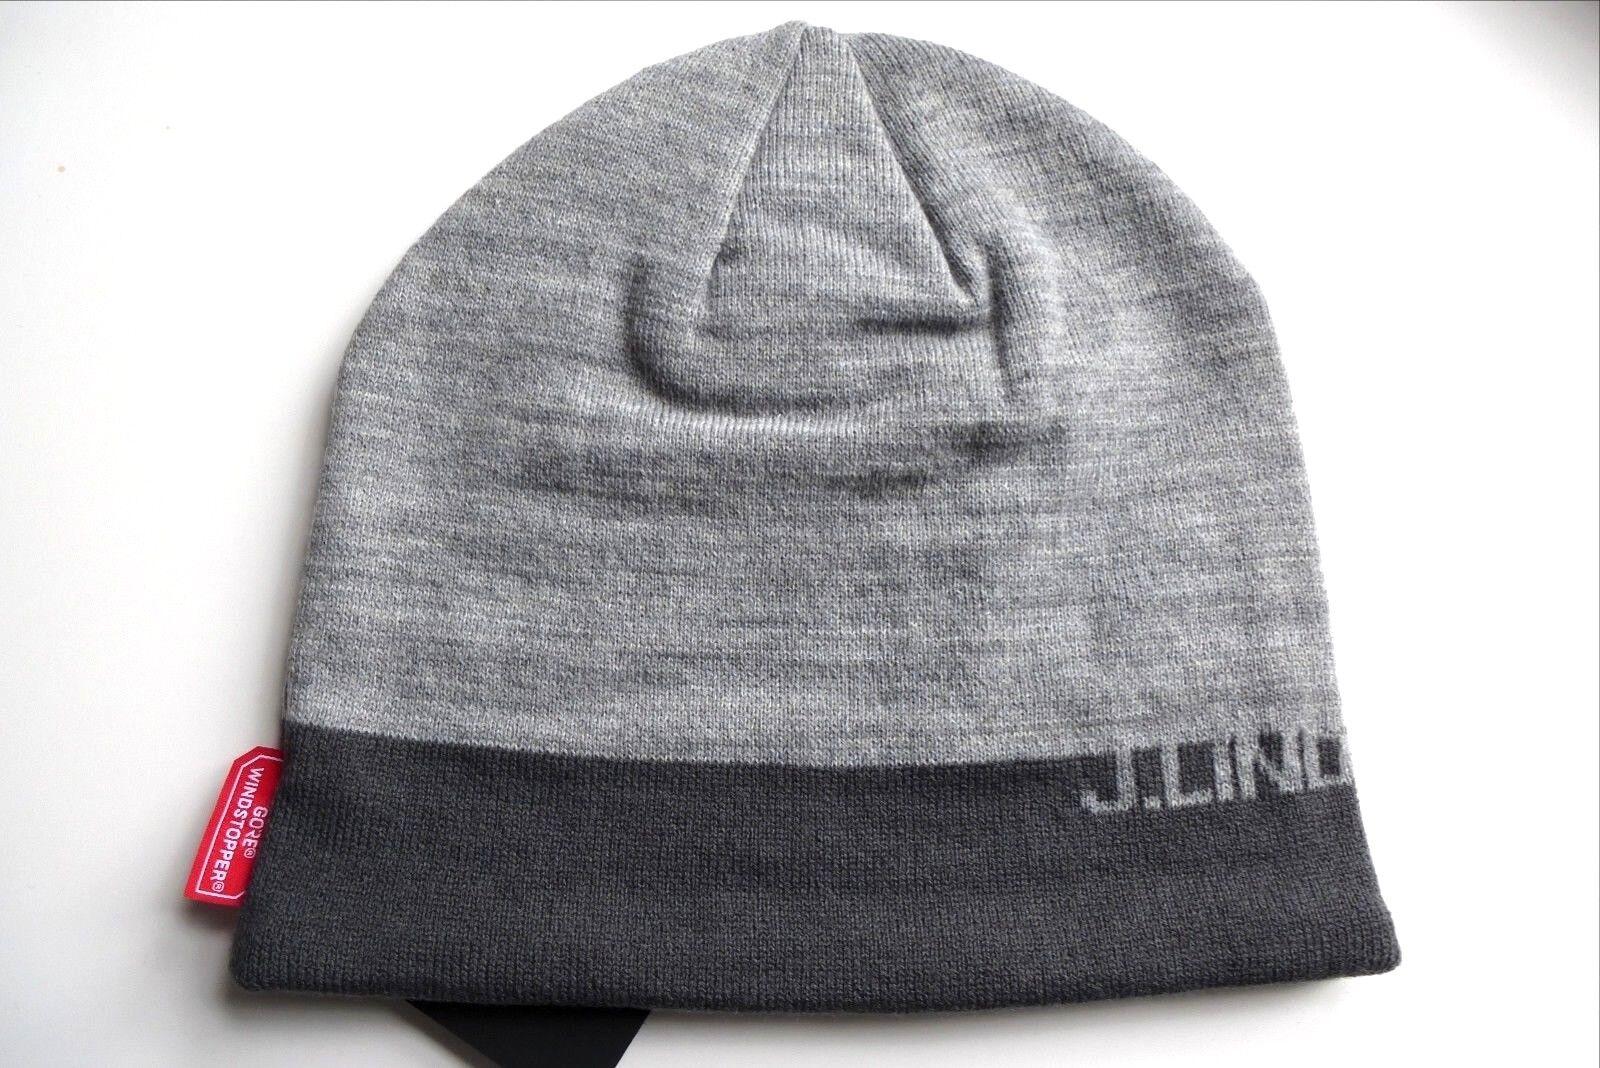 J.LINDEBERG Sweden 50% Wool GREY MELANGE GORE WINDSTOPPER Beanie Toque Unisex